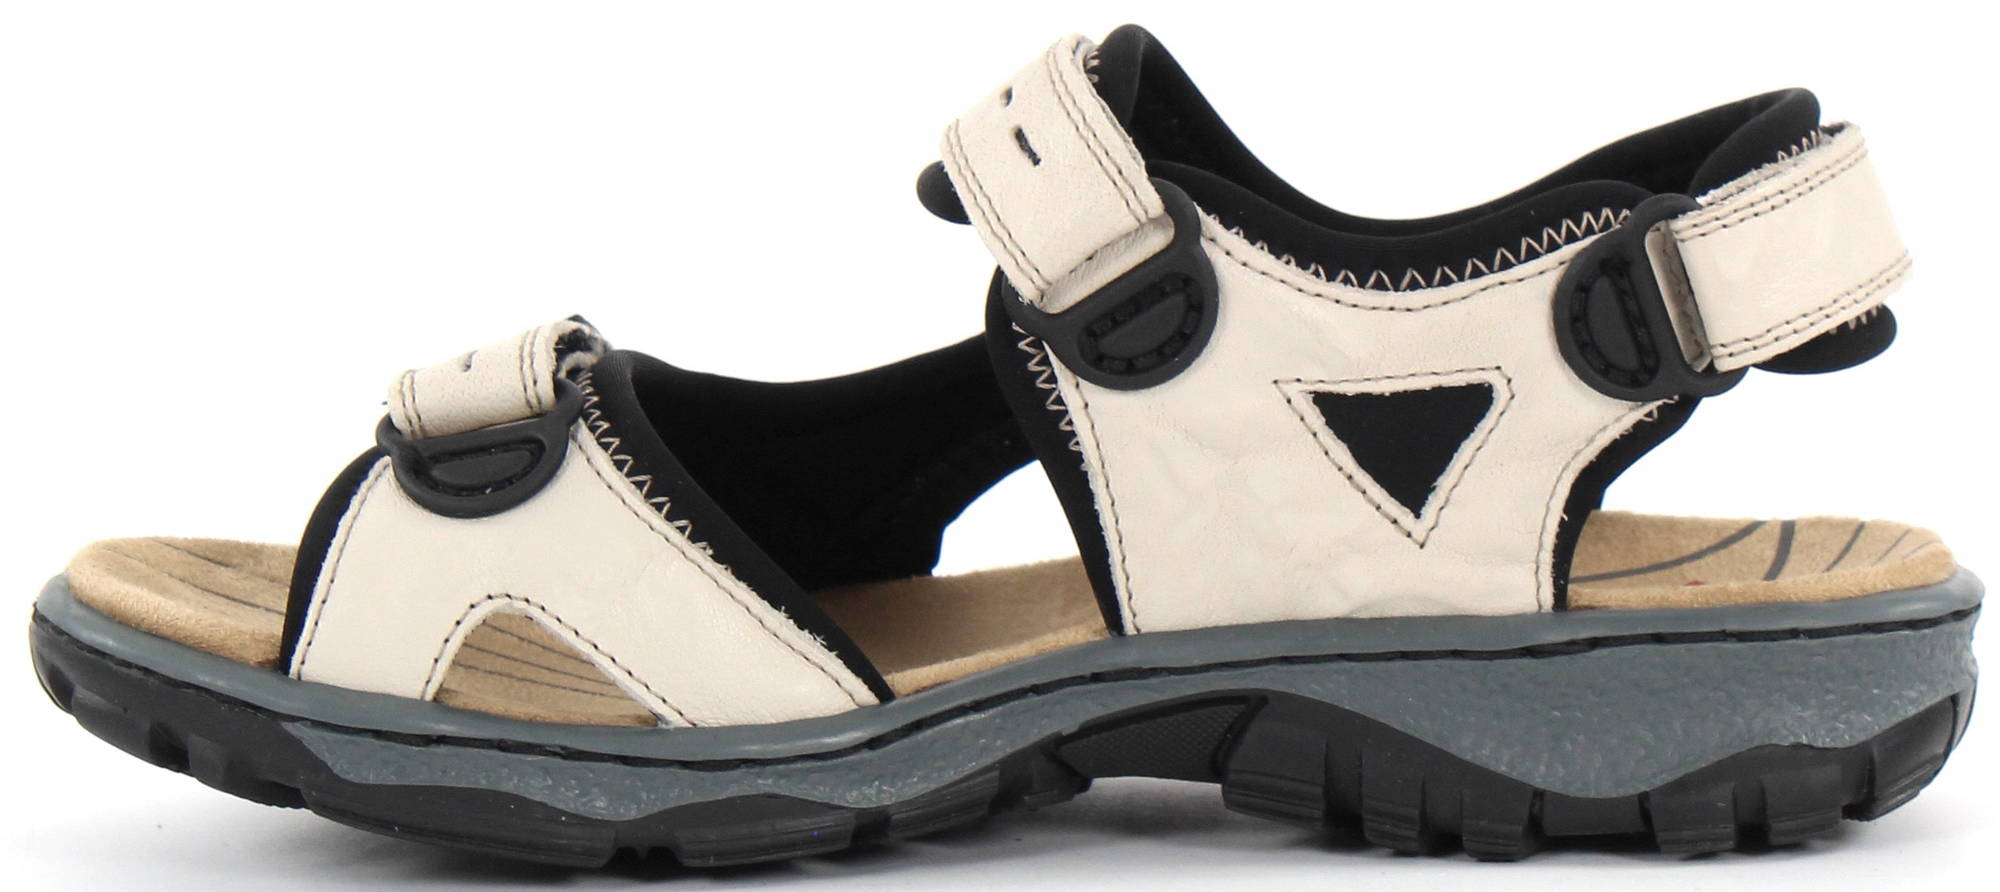 Rieker Sandaler 68872 60 beige